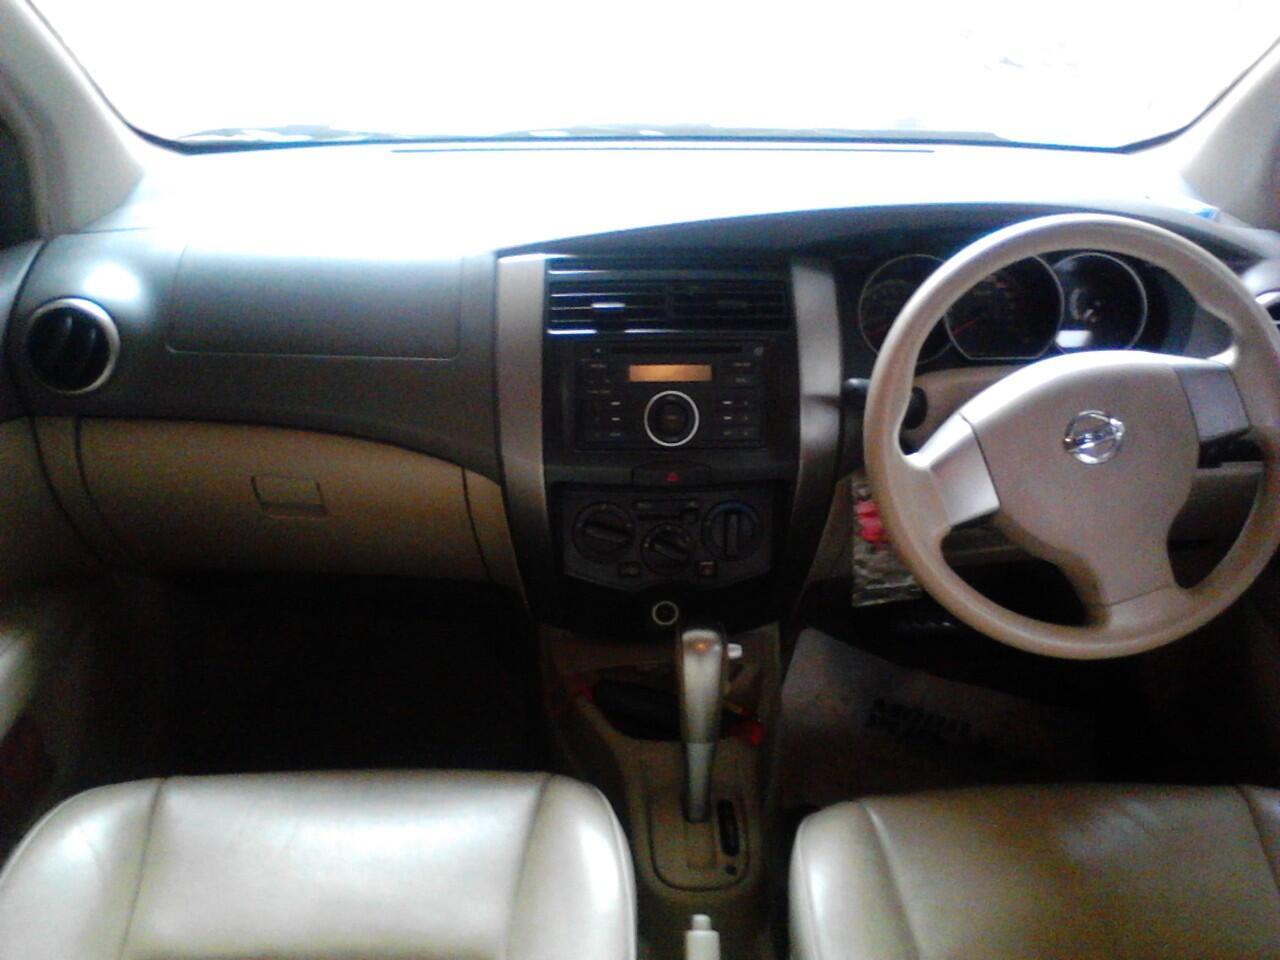 Nissan GRAND LIVINA XV A/T 2007